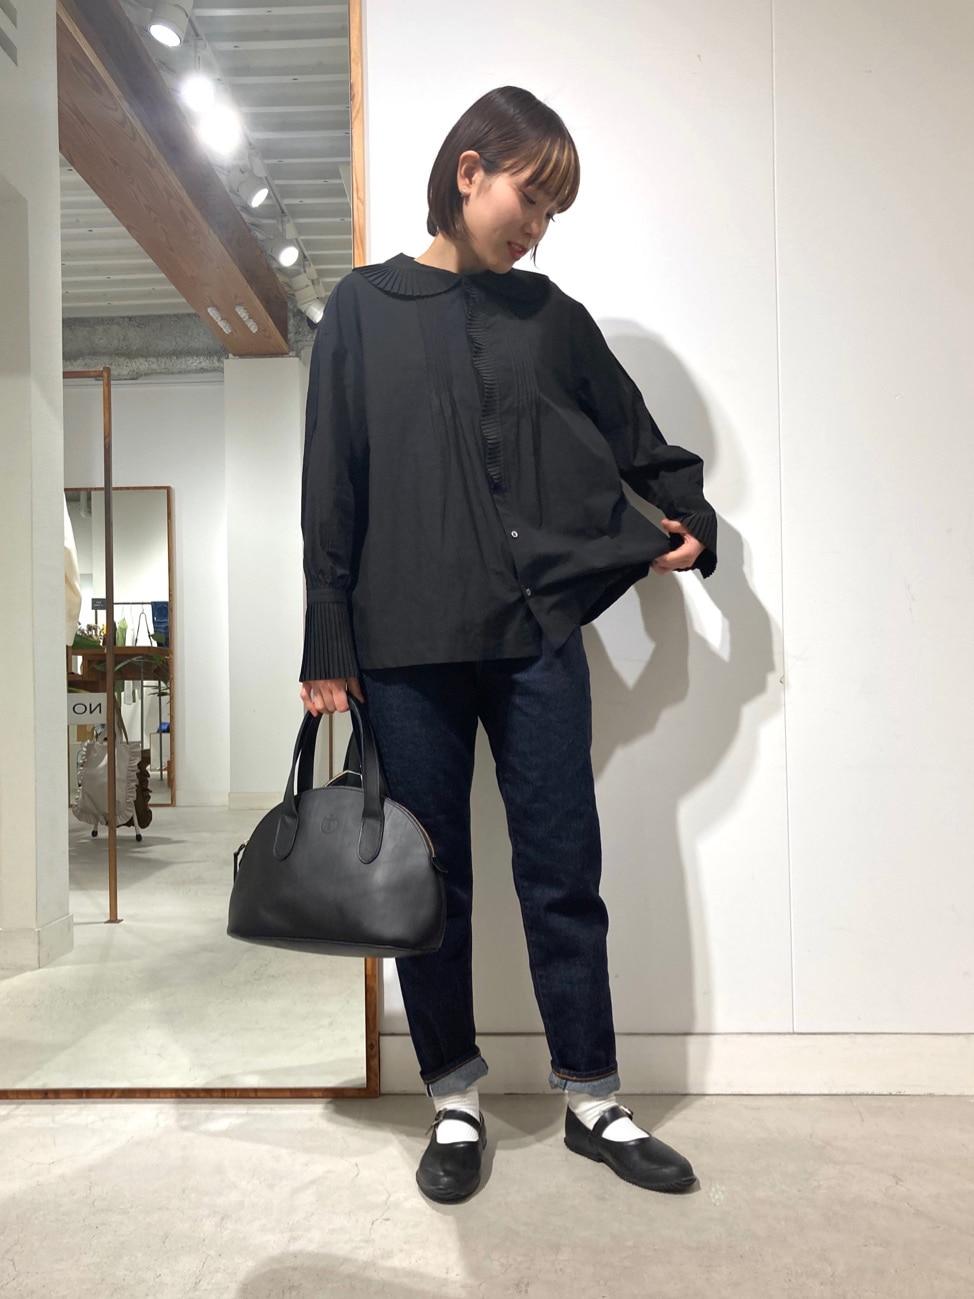 l'atelier du savon 名古屋栄路面 身長:161cm 2021.01.12